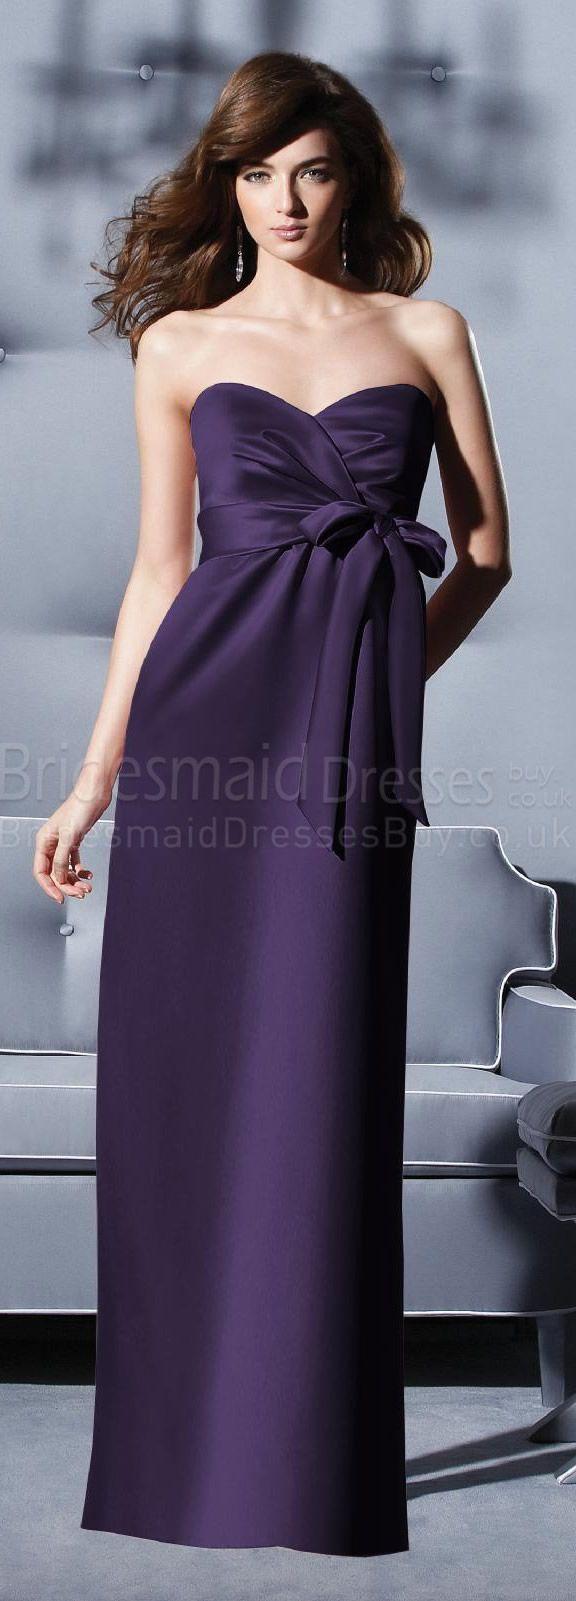 Purple bridesmaid dresslong bridesmaid dresses fashion